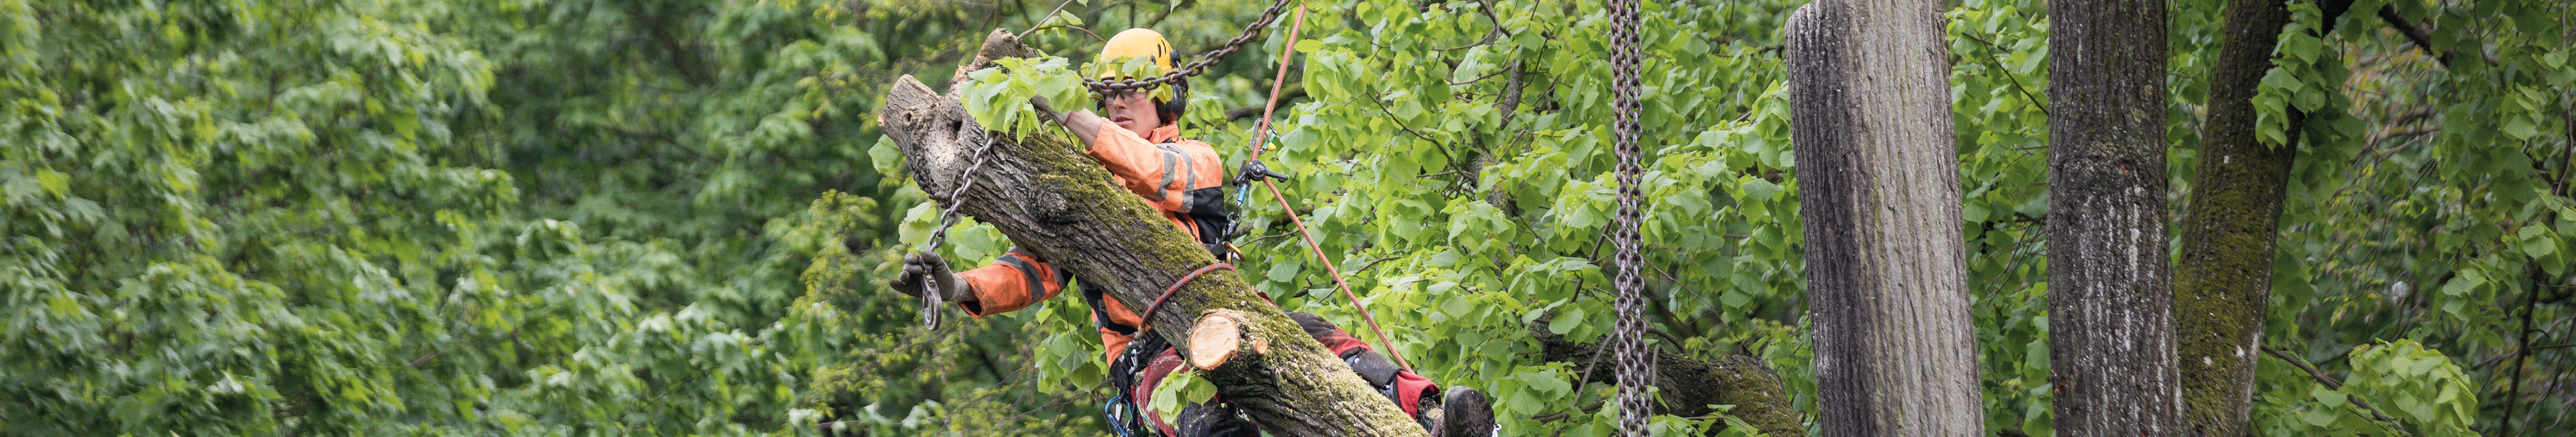 Nürnberger Baumpflege - Leistungen Baumfällung in Nürnberg und Umgebung